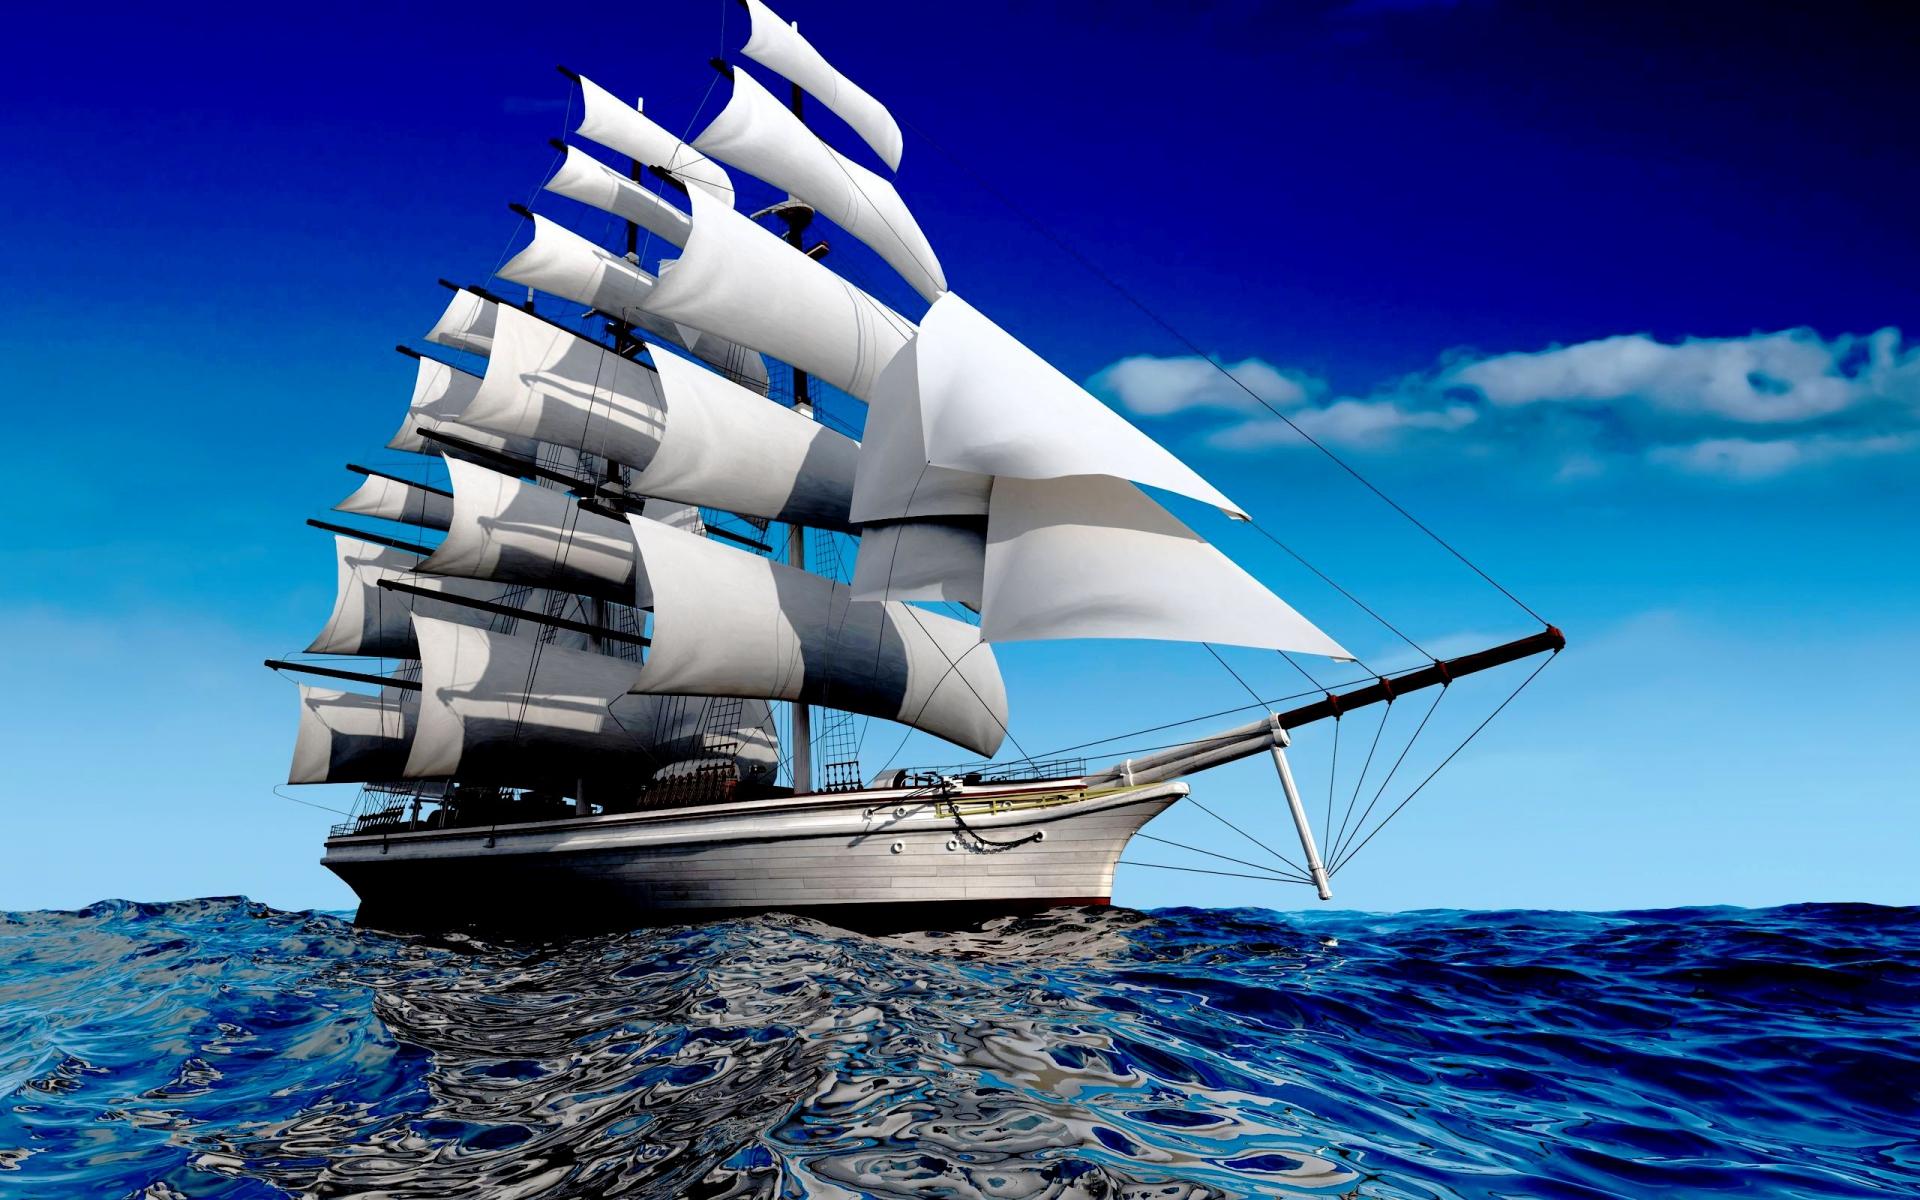 Boat Wallpaper 9156 1920x1200 px HDWallSourcecom